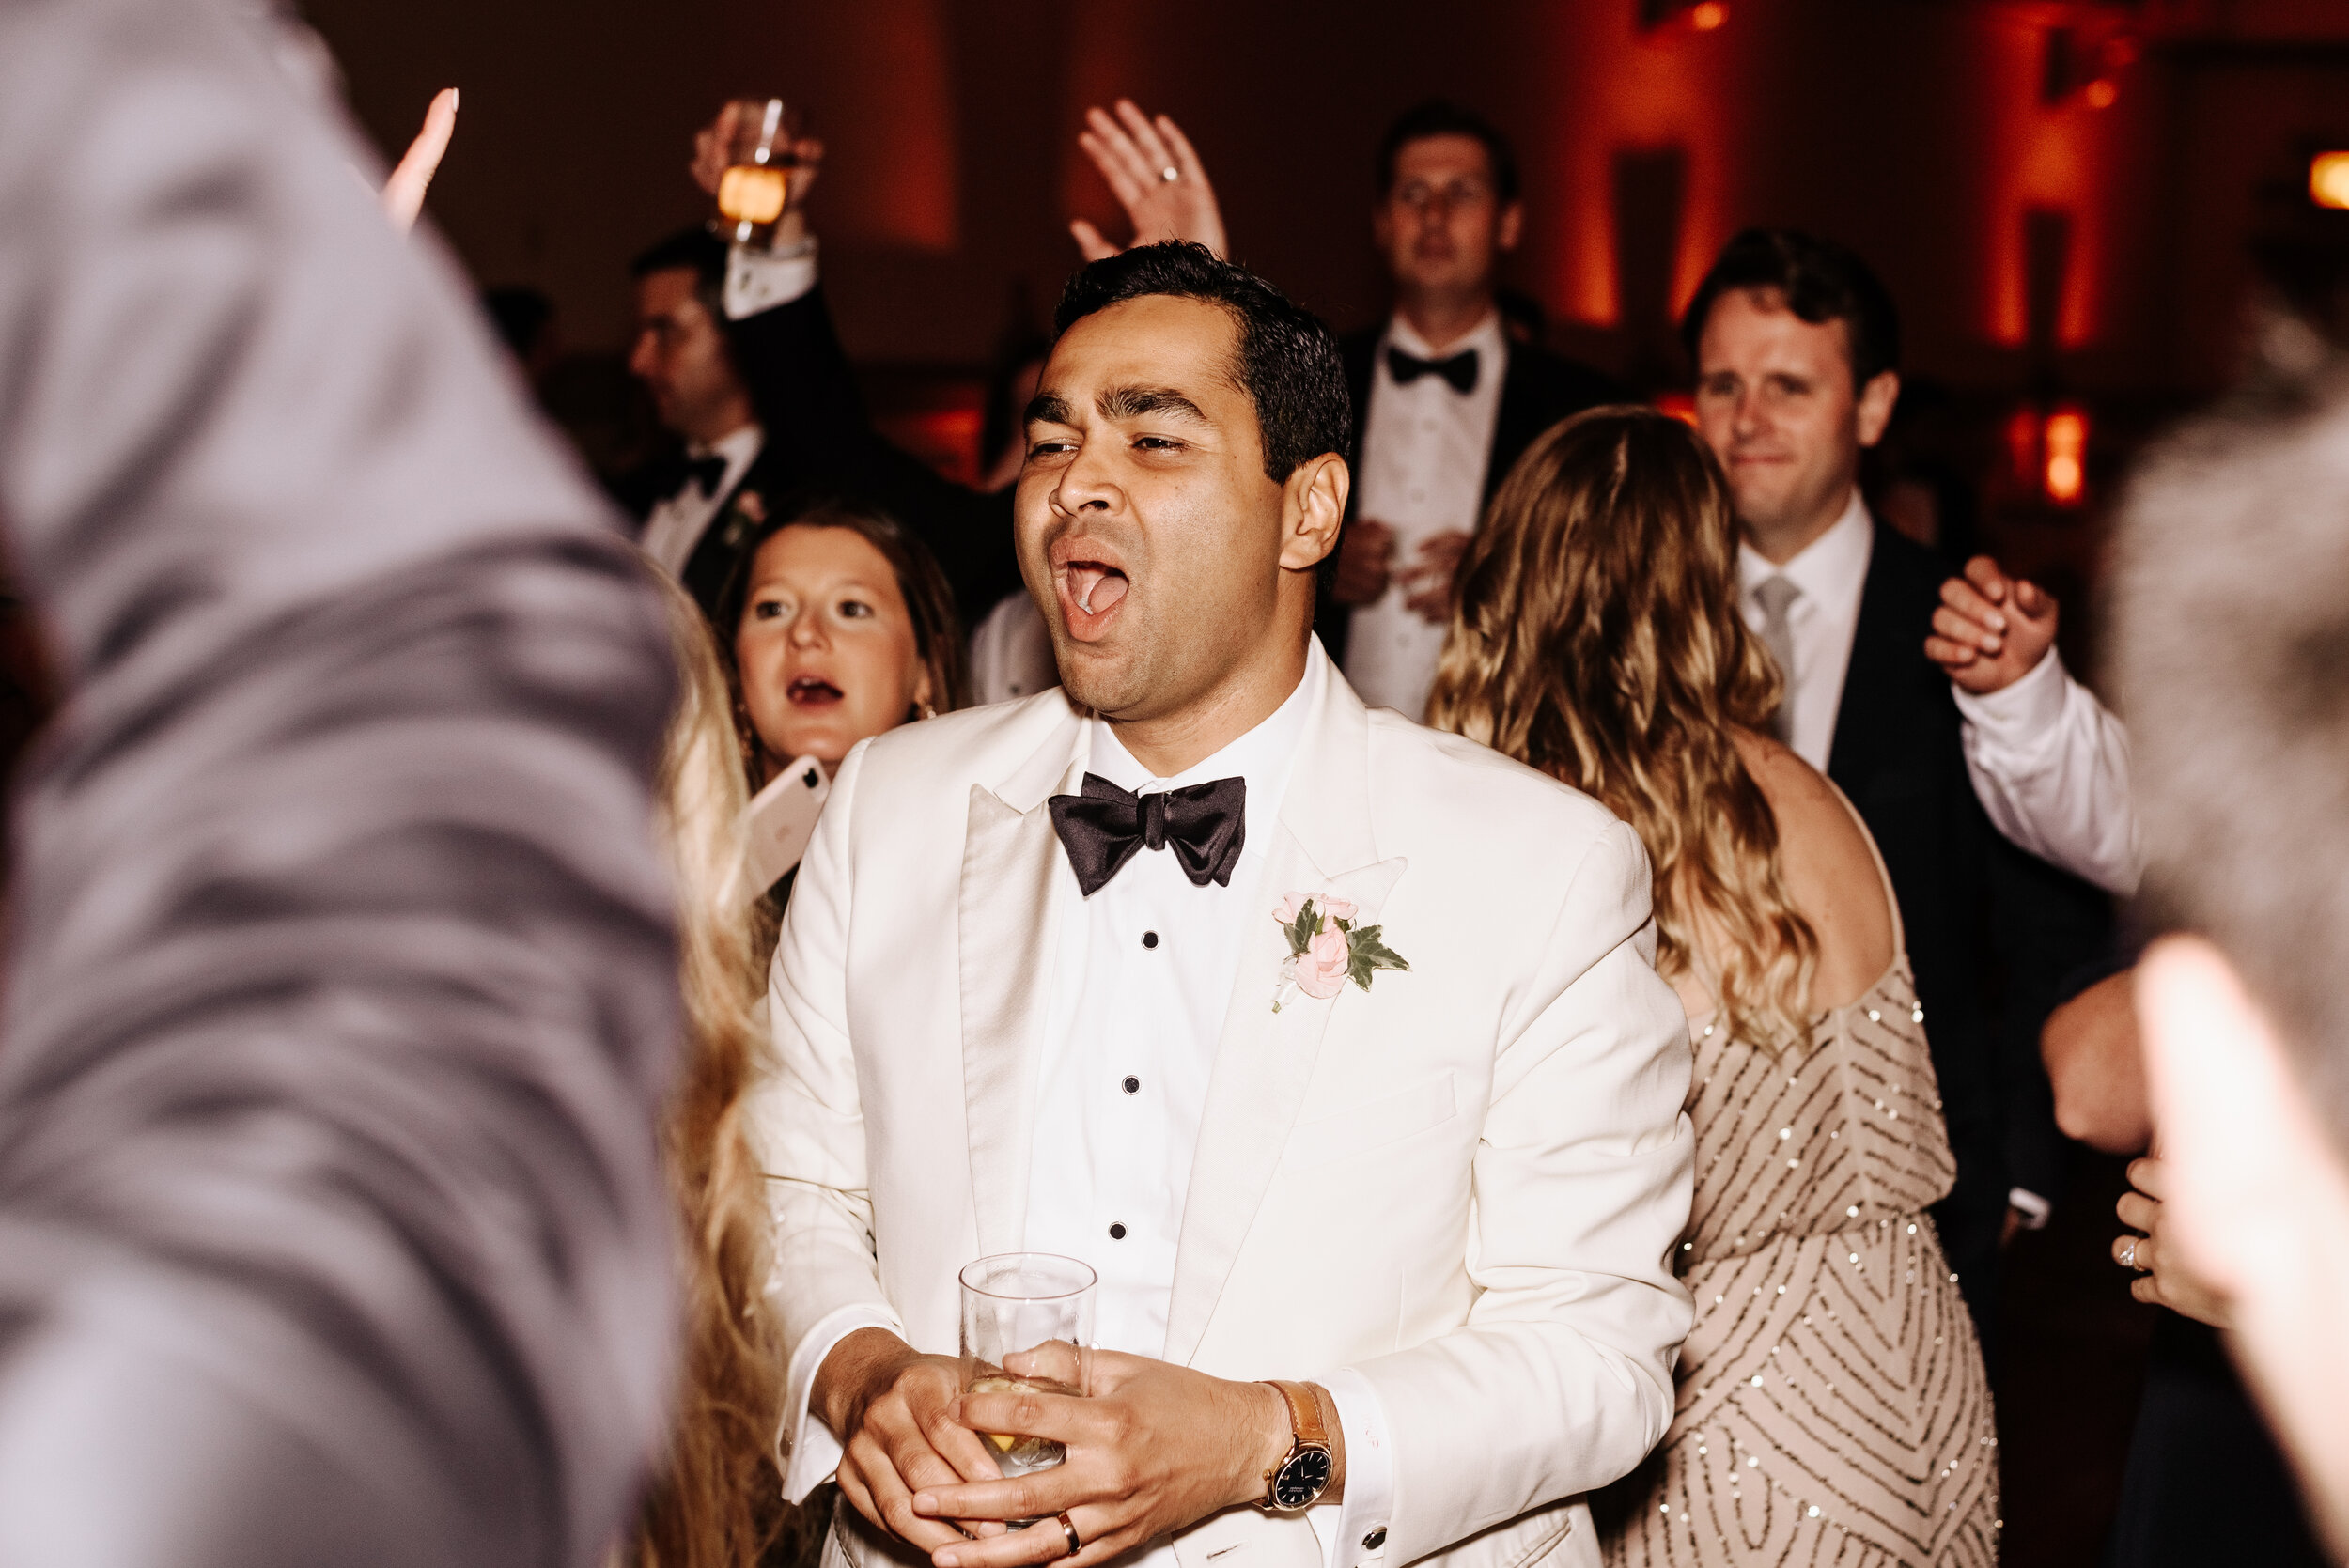 Cassie-Mrunal-Wedding-Quirk-Hotel-John-Marshall-Ballrooms-Richmond-Virginia-Photography-by-V-109.jpg